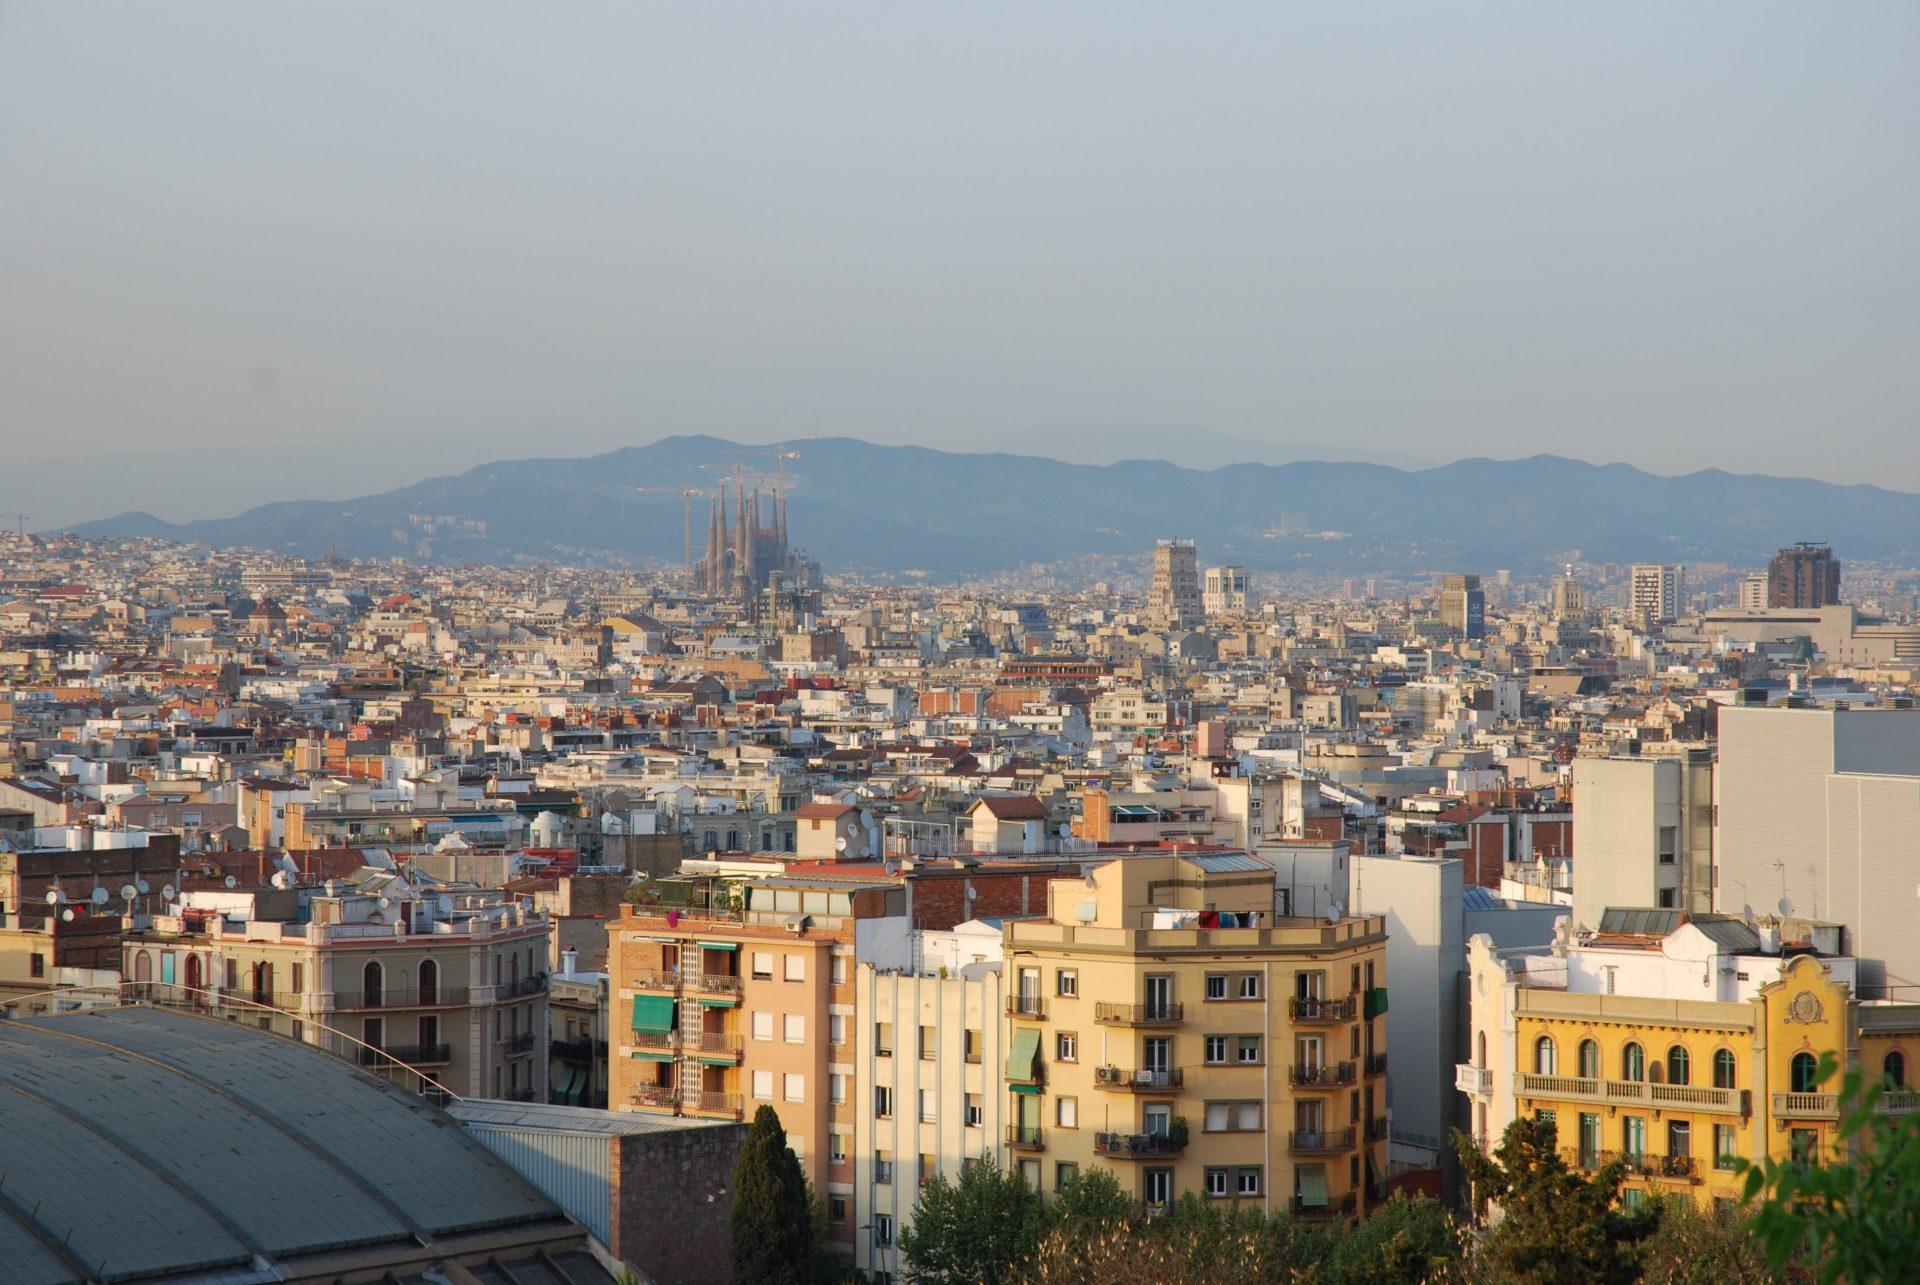 Вид на город, Барселона, Испания. Апрель, 2011